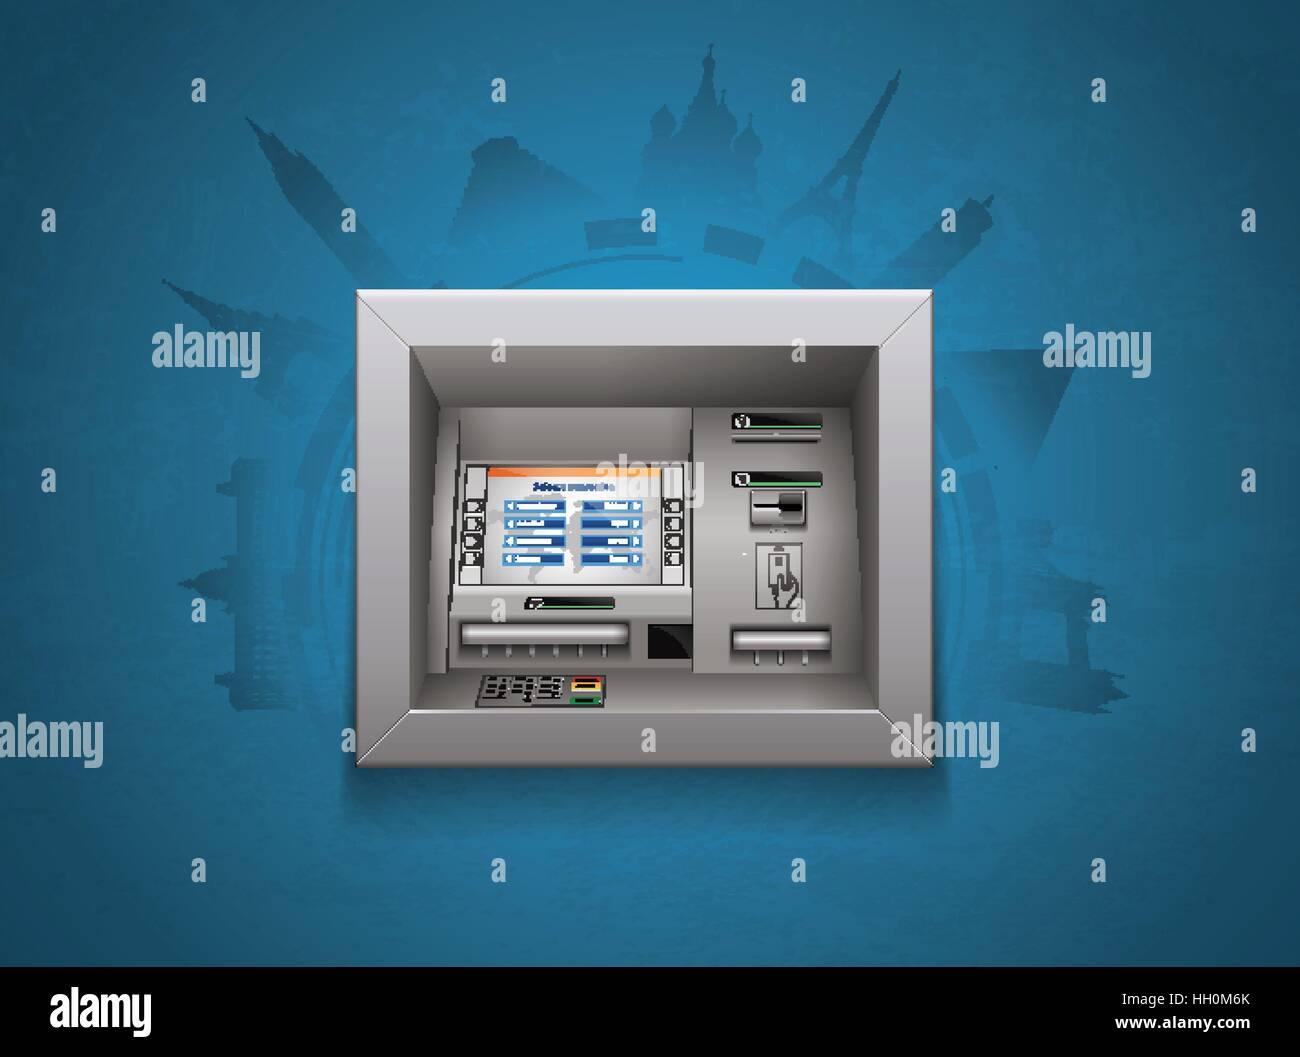 ATM - Automated teller machine - cash concept - Stock Image